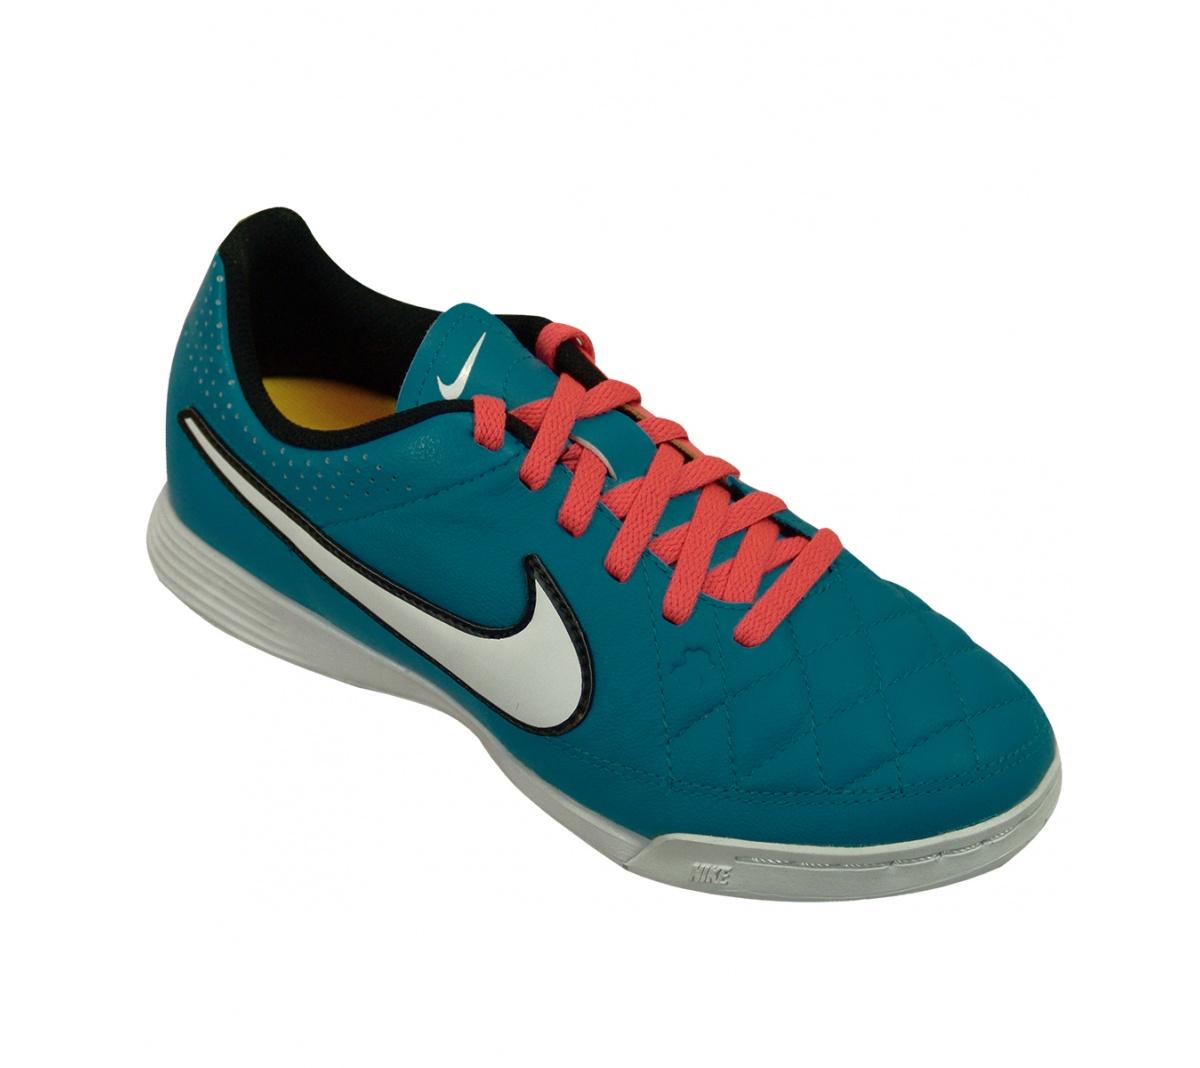 e236235c080dc Tênis Nike Tiempo Genio Leather Futsal Infantil - Mundo do Futebol